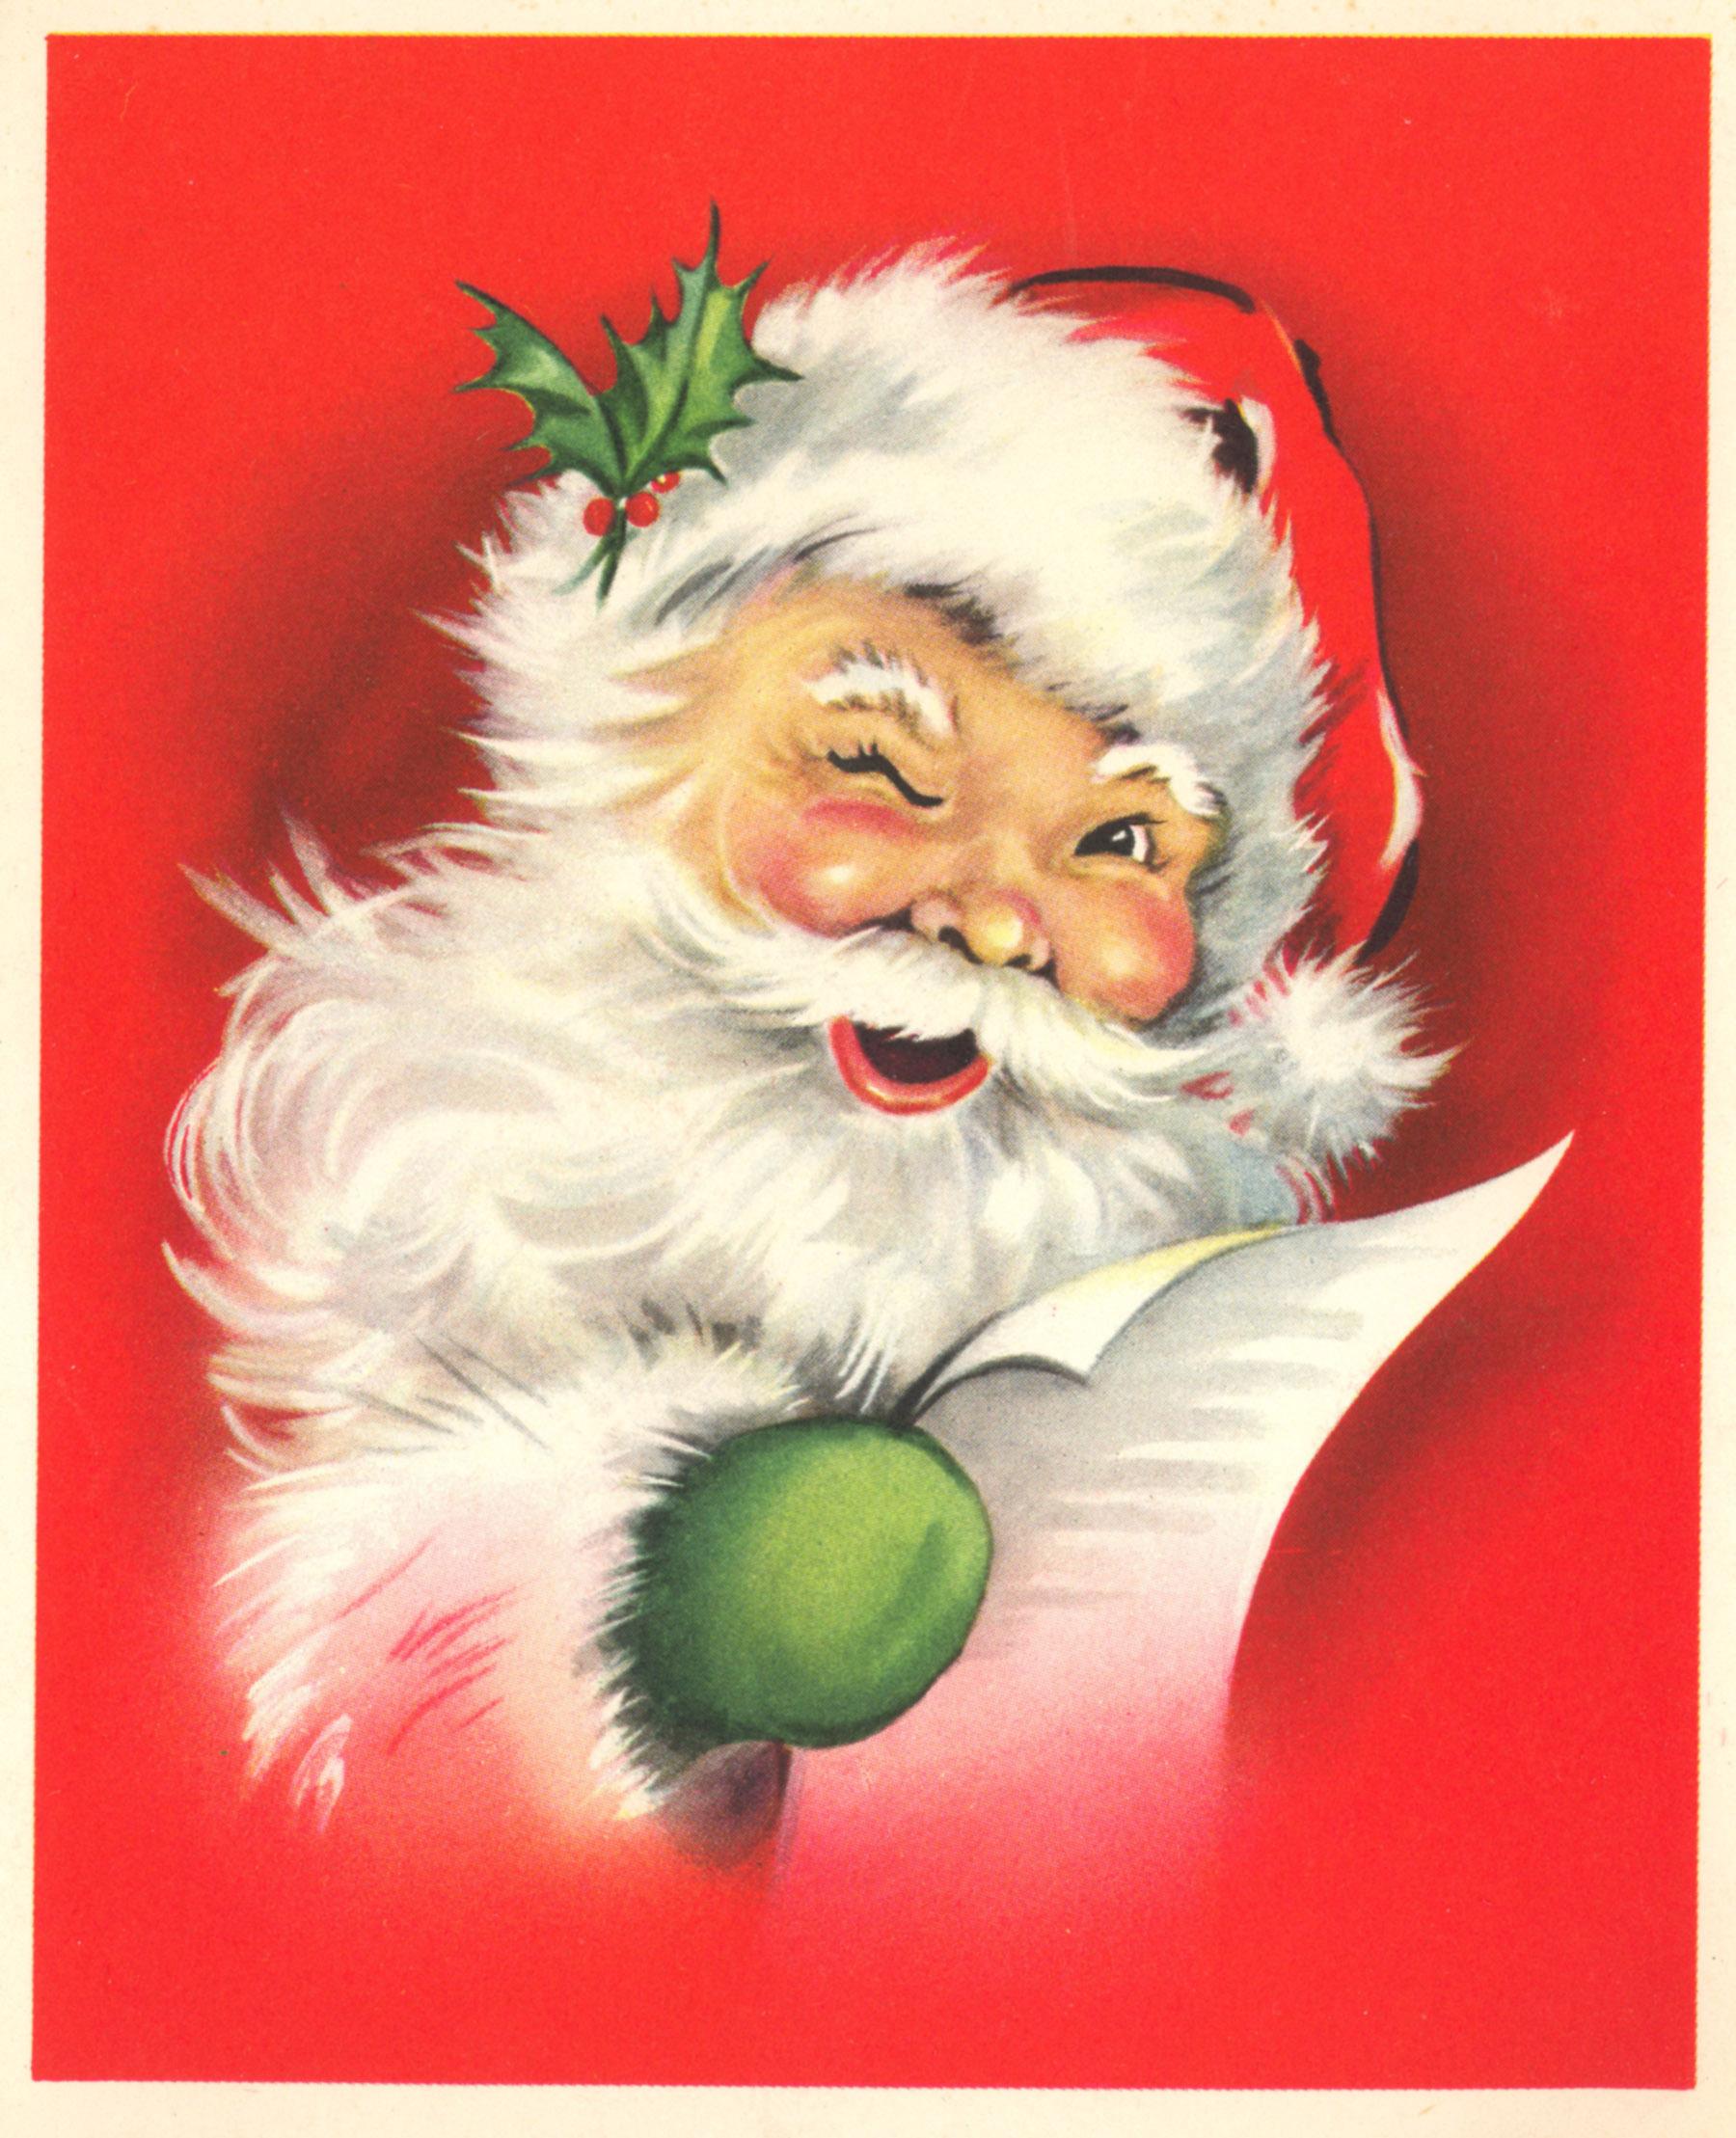 Santa Claus Wallpaper Free